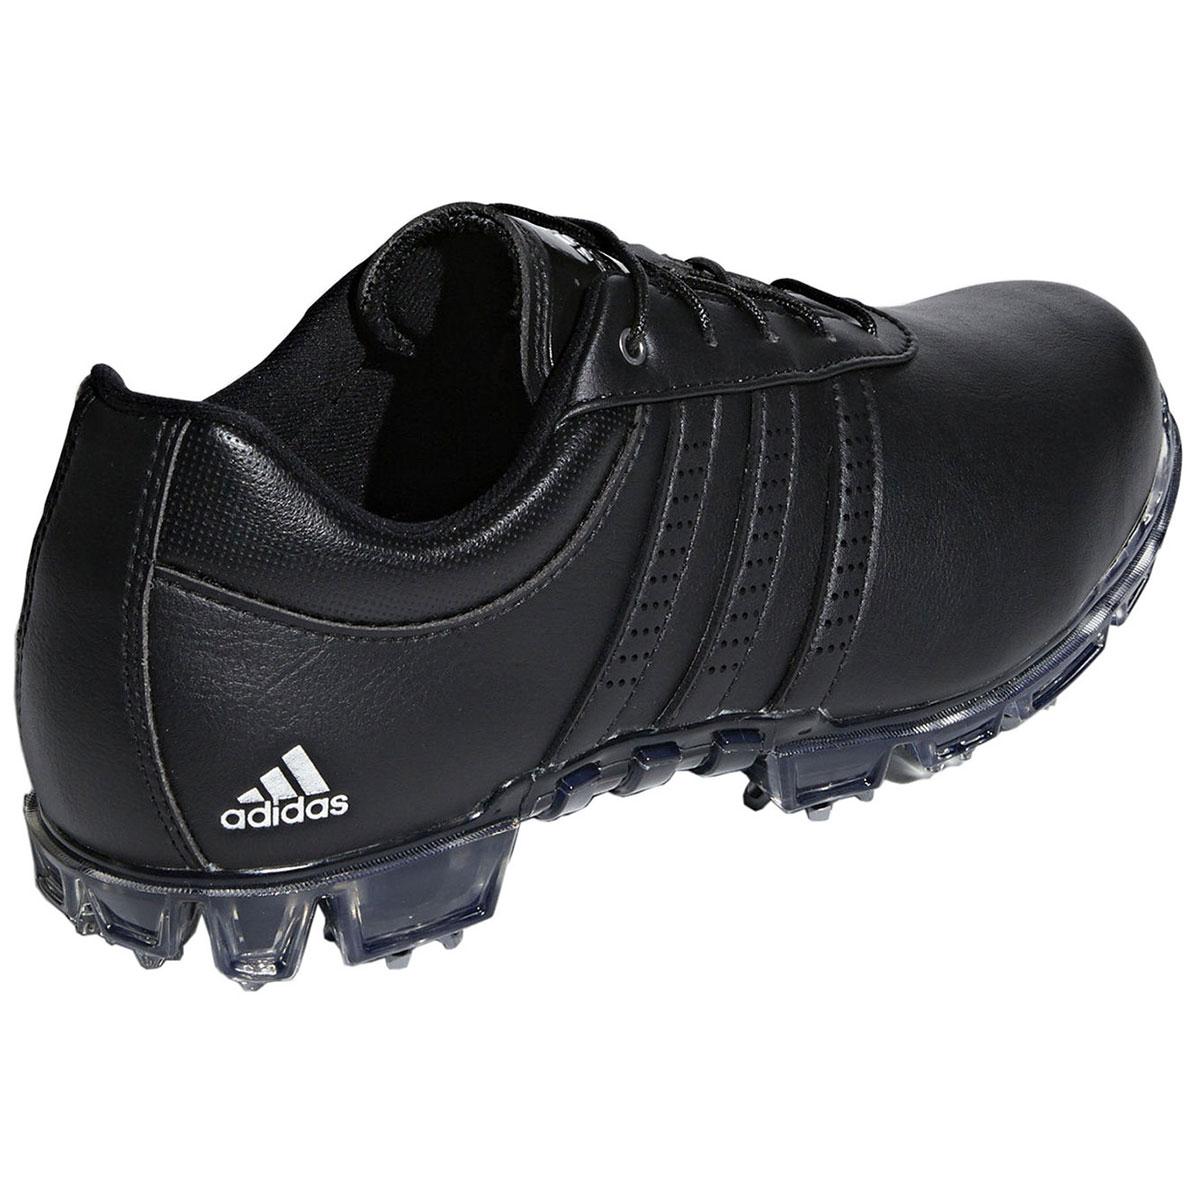 adidas adipure flex golf shoes mens